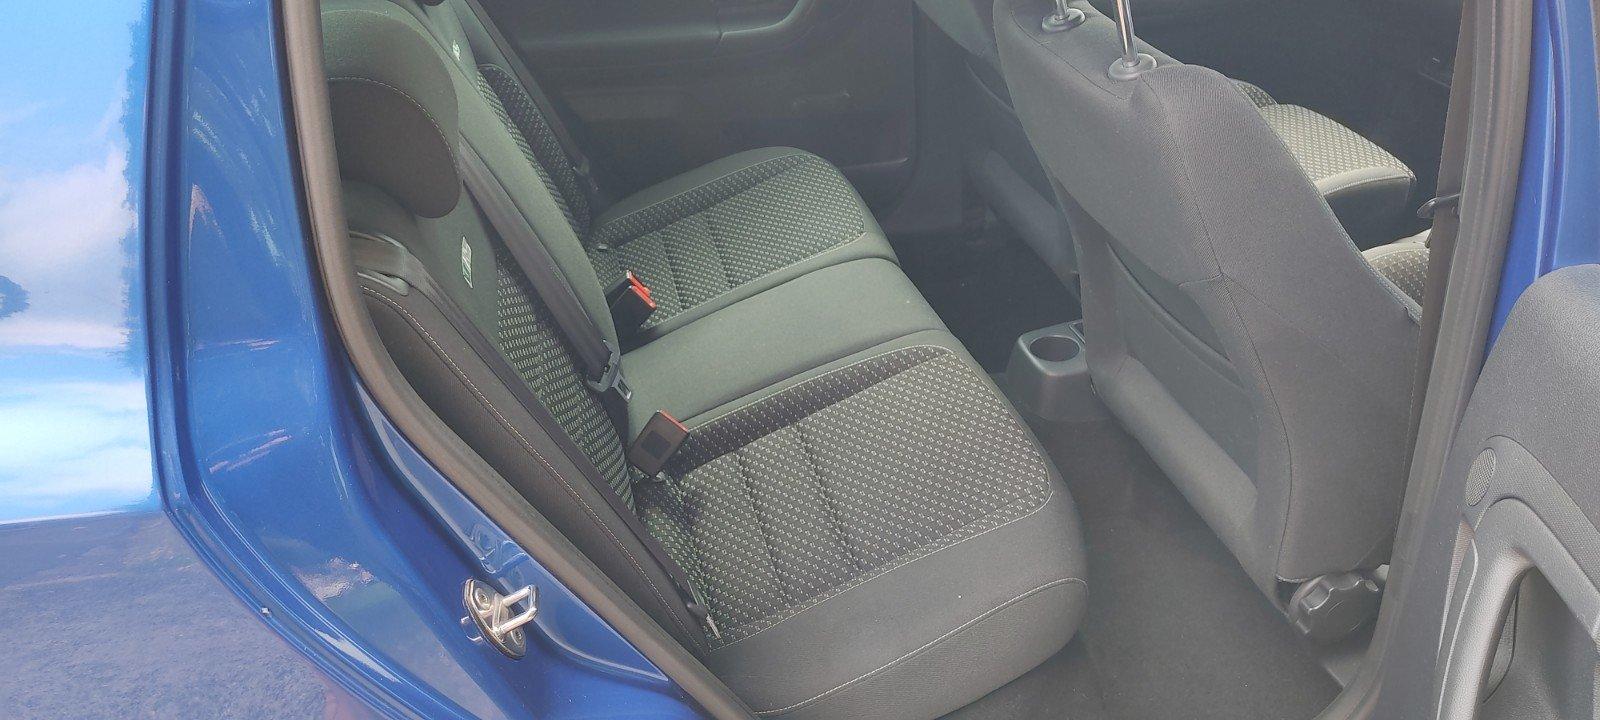 2013 Skoda Fabia VRS Hatch, FSH, 57k miles, Blue For Sale (picture 6 of 6)